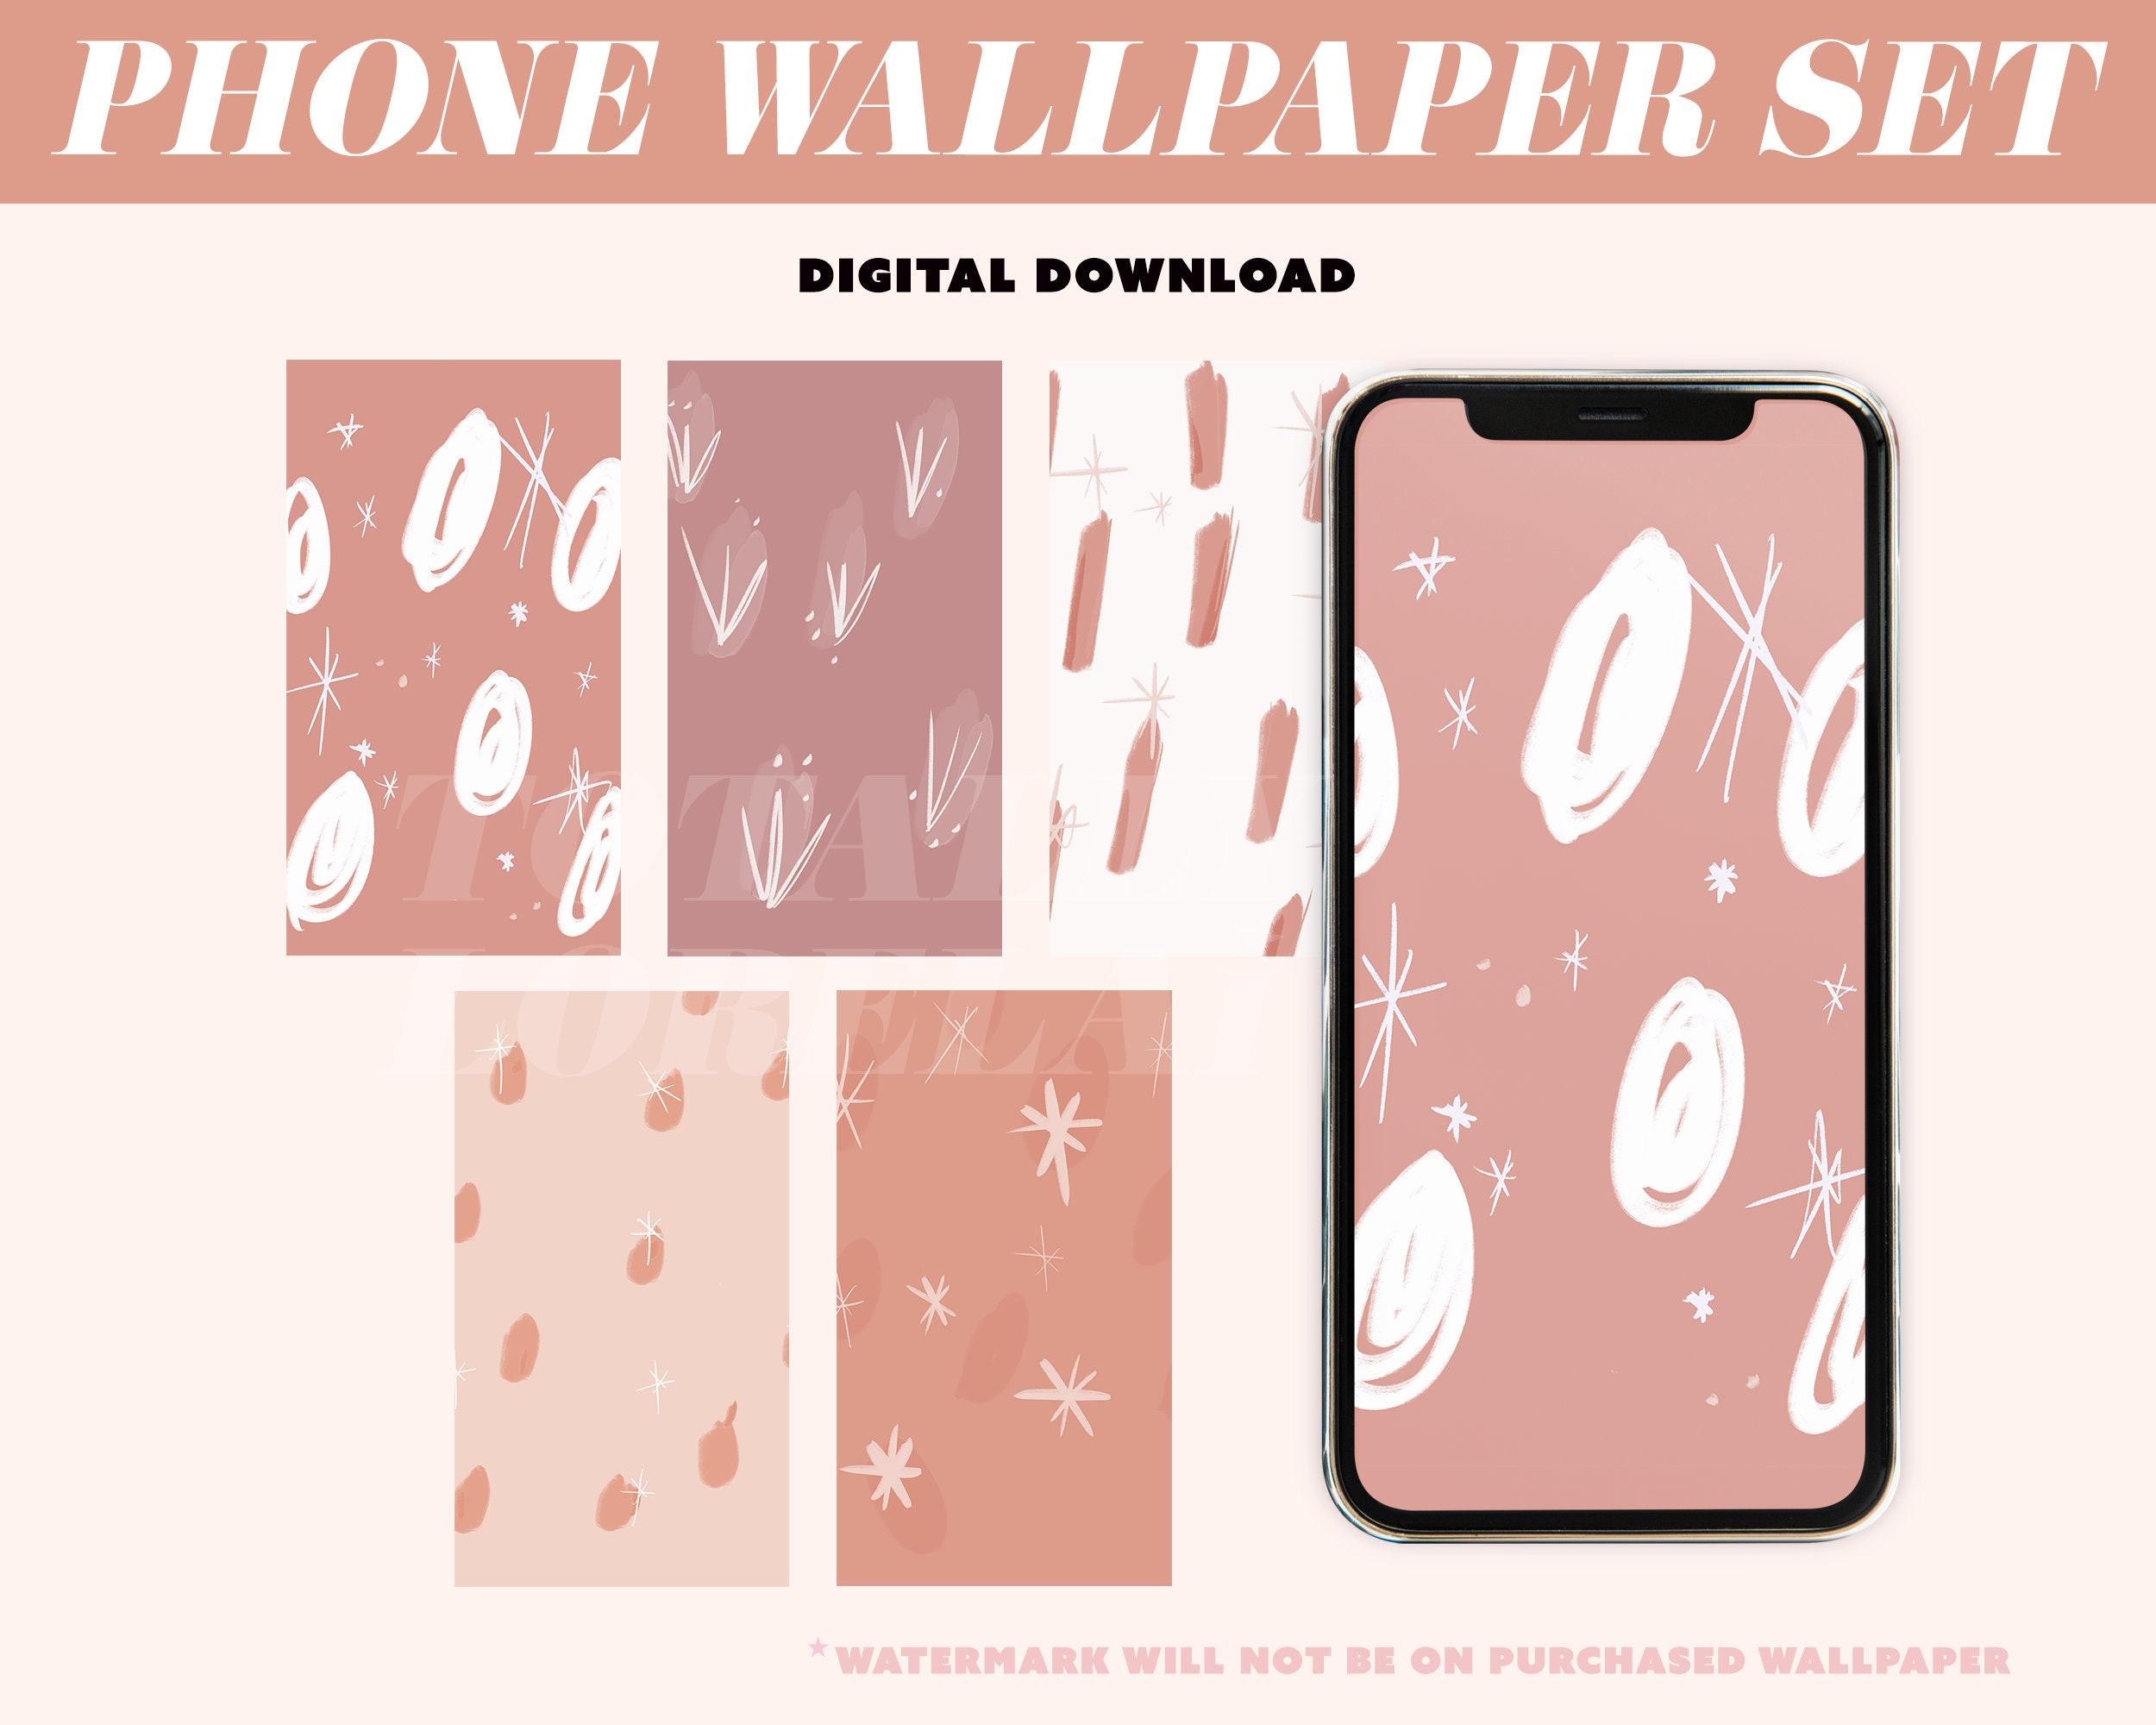 Stars Abstract Wallpaper / Sienna / Mauve / Phone Wallpaper / Digital  Download / Phone Background / iPhone Wallpaper / Burnt Orange